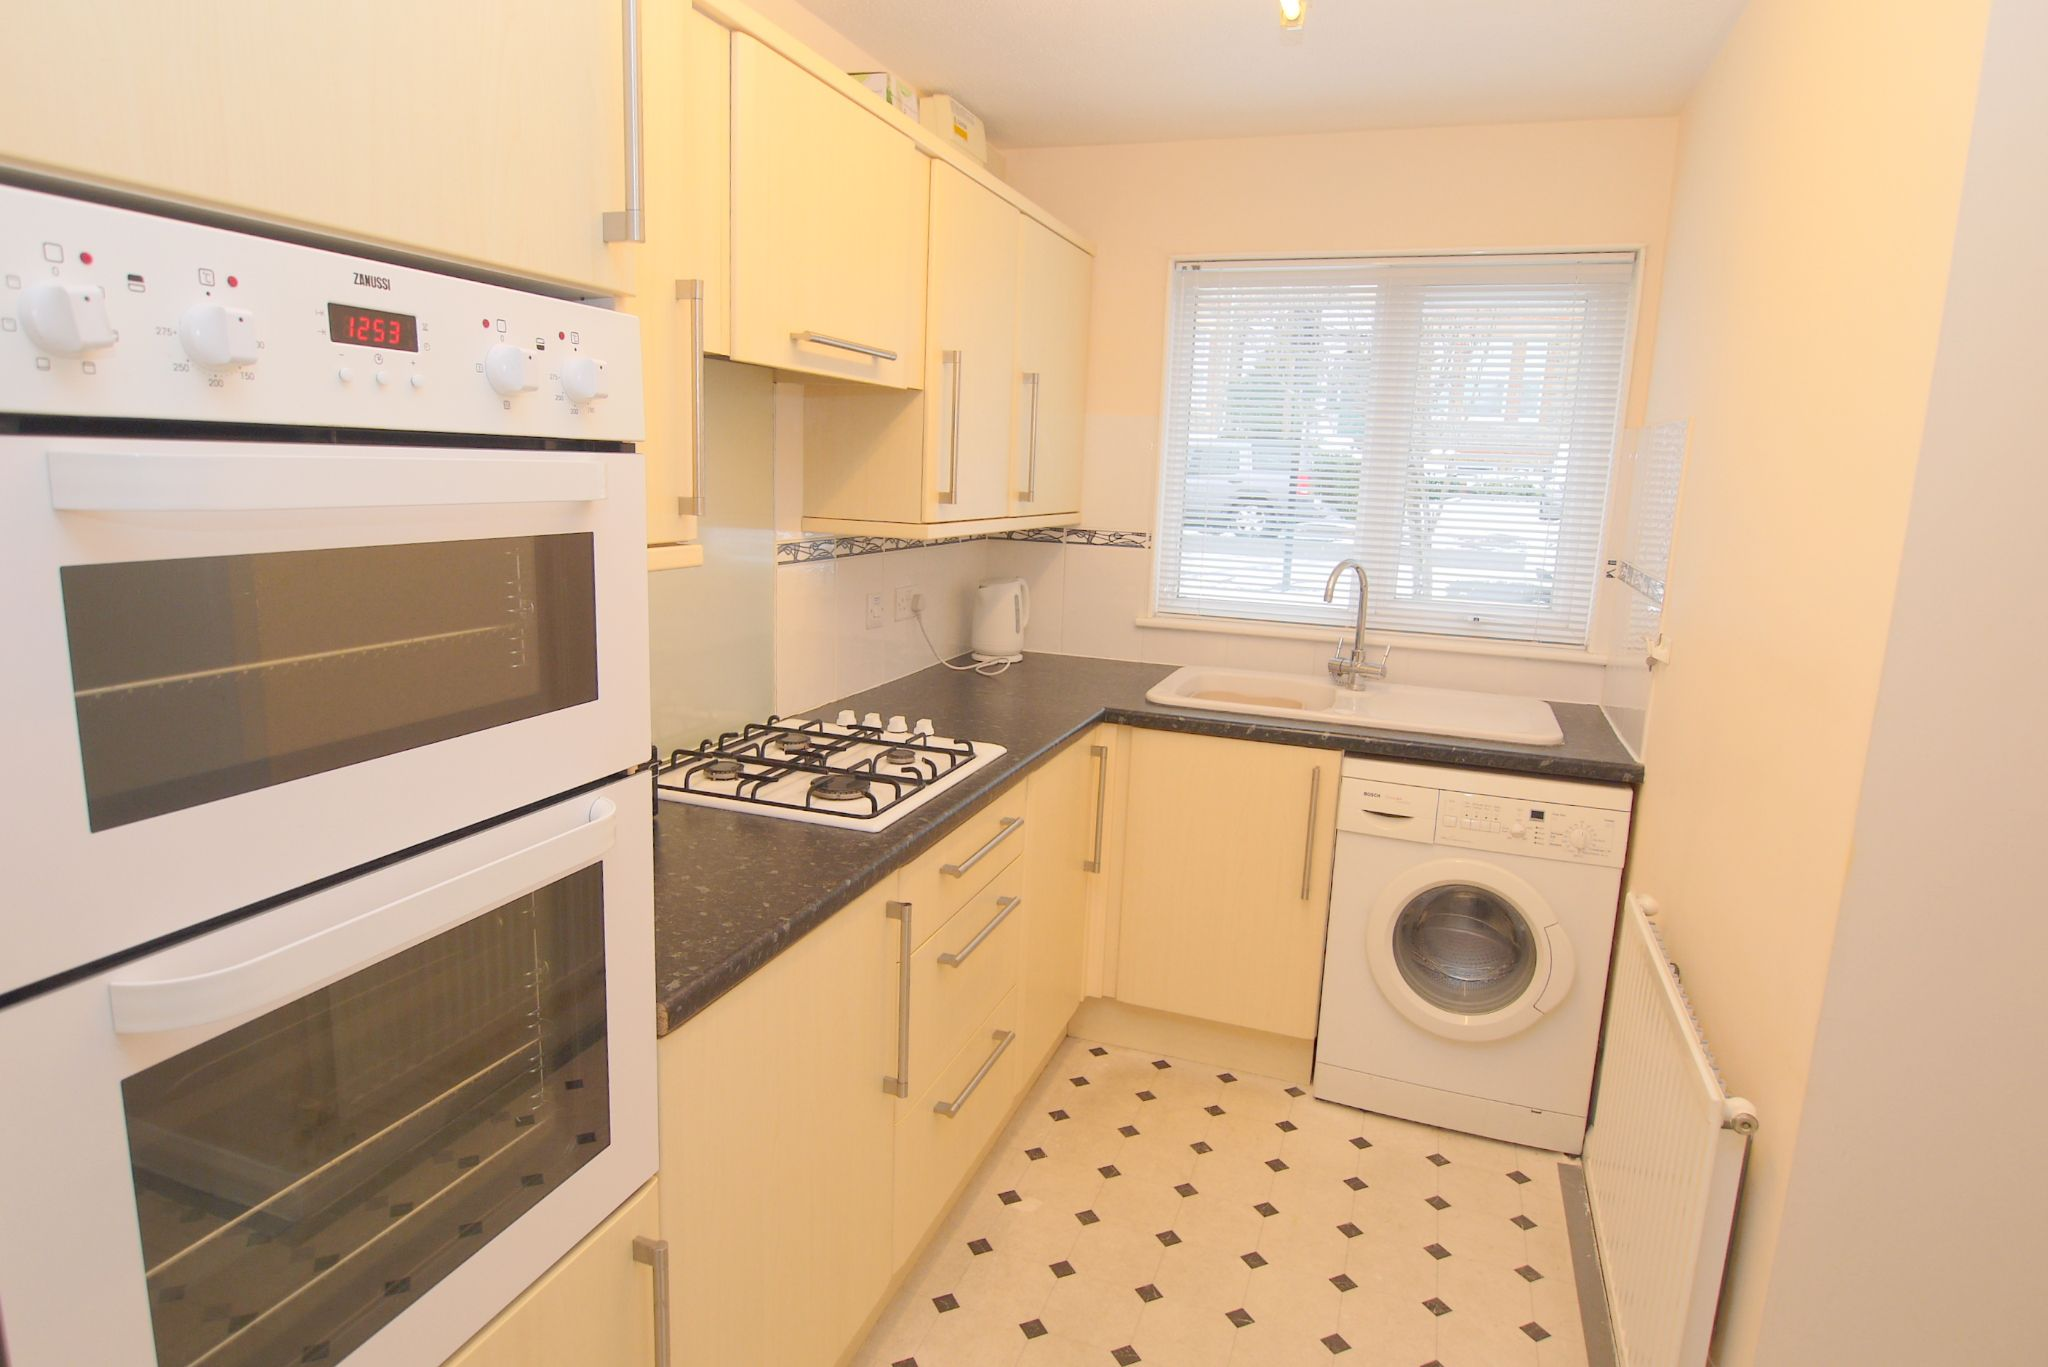 2 bedroom semi-detached house Sold in Sevenoaks - Photograph 3